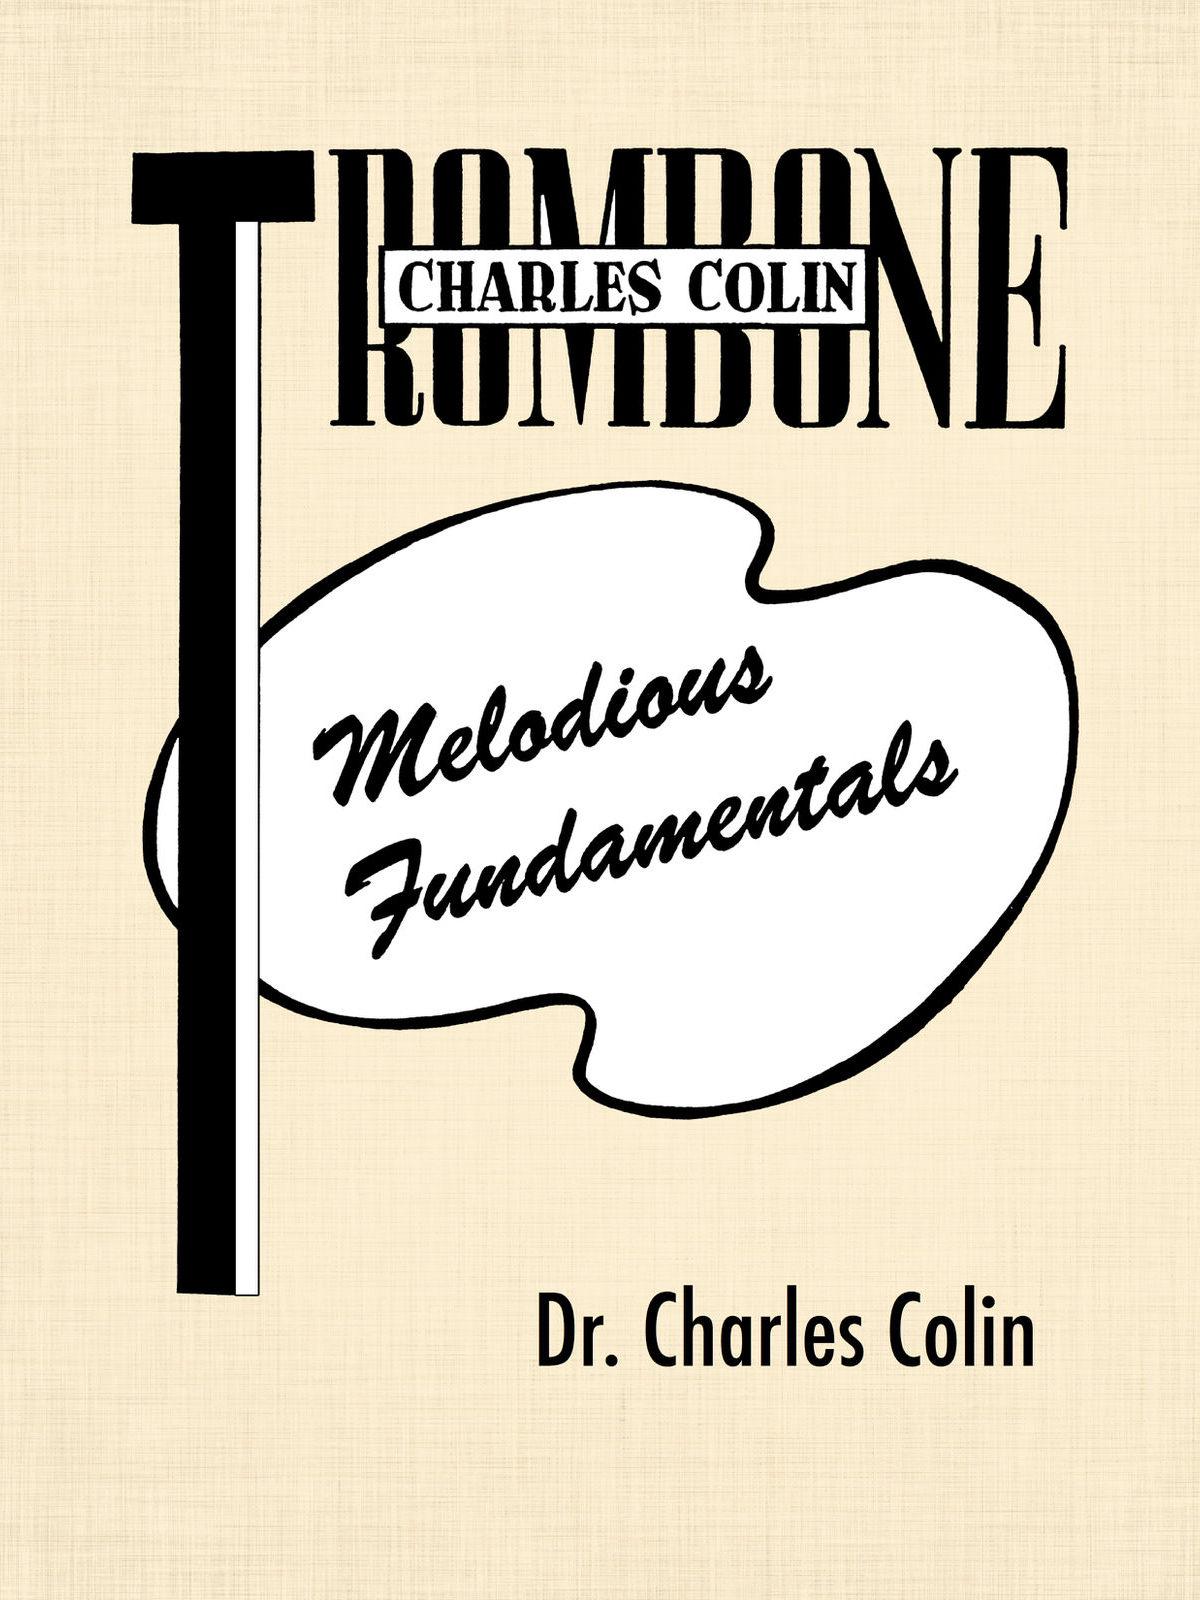 Colin, Melodious Fundamentals-p01